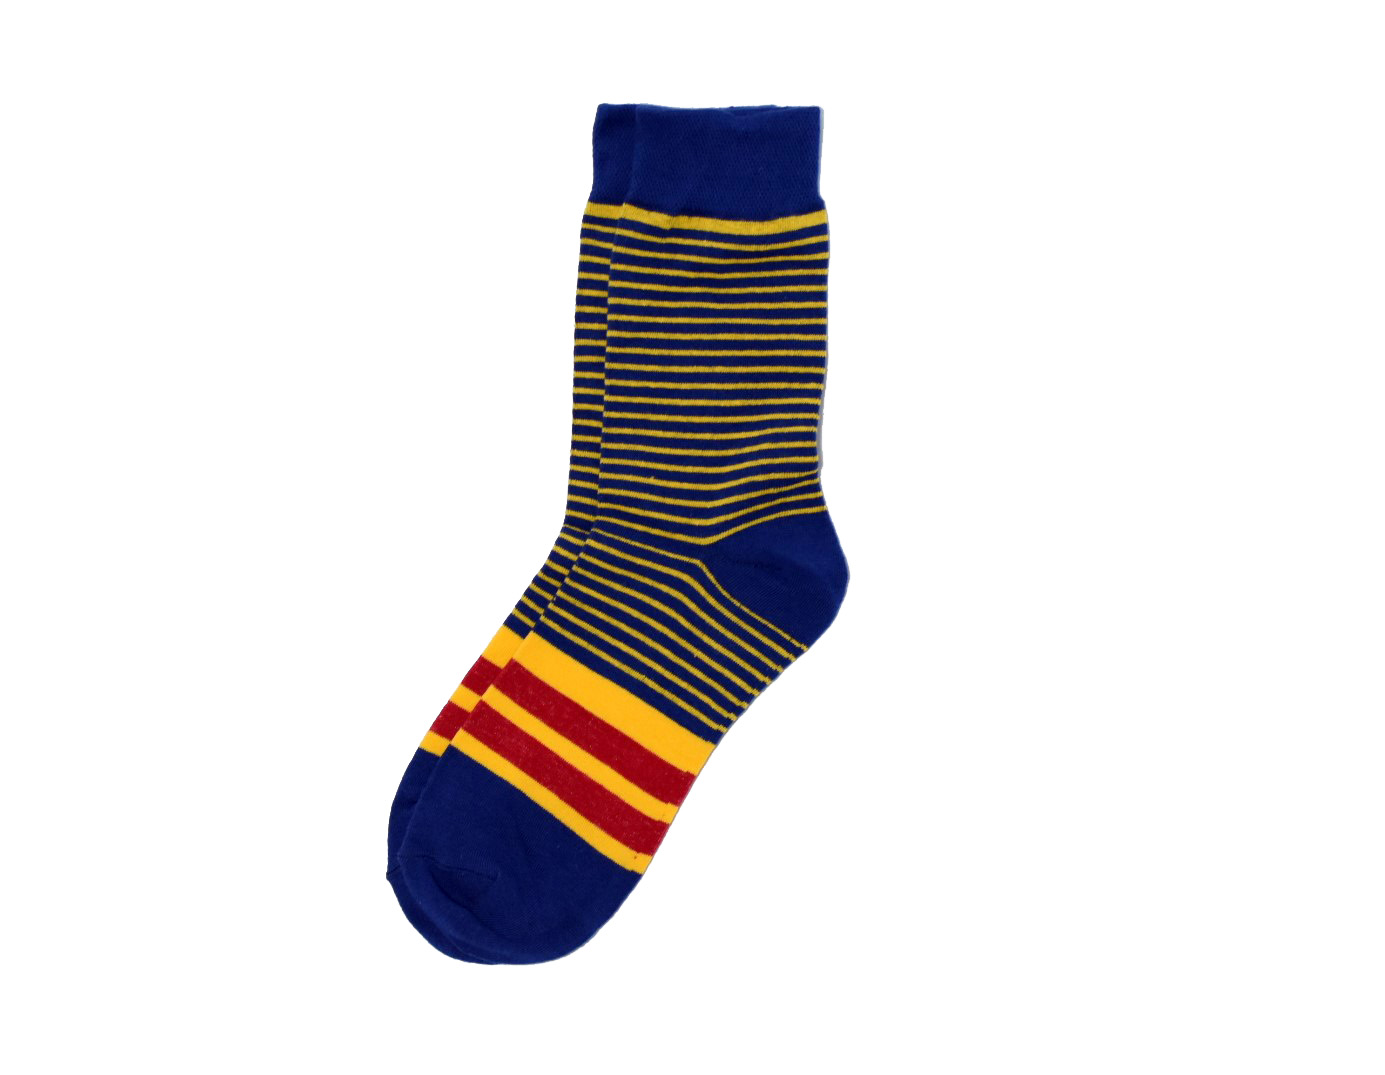 X-men wolverine socks